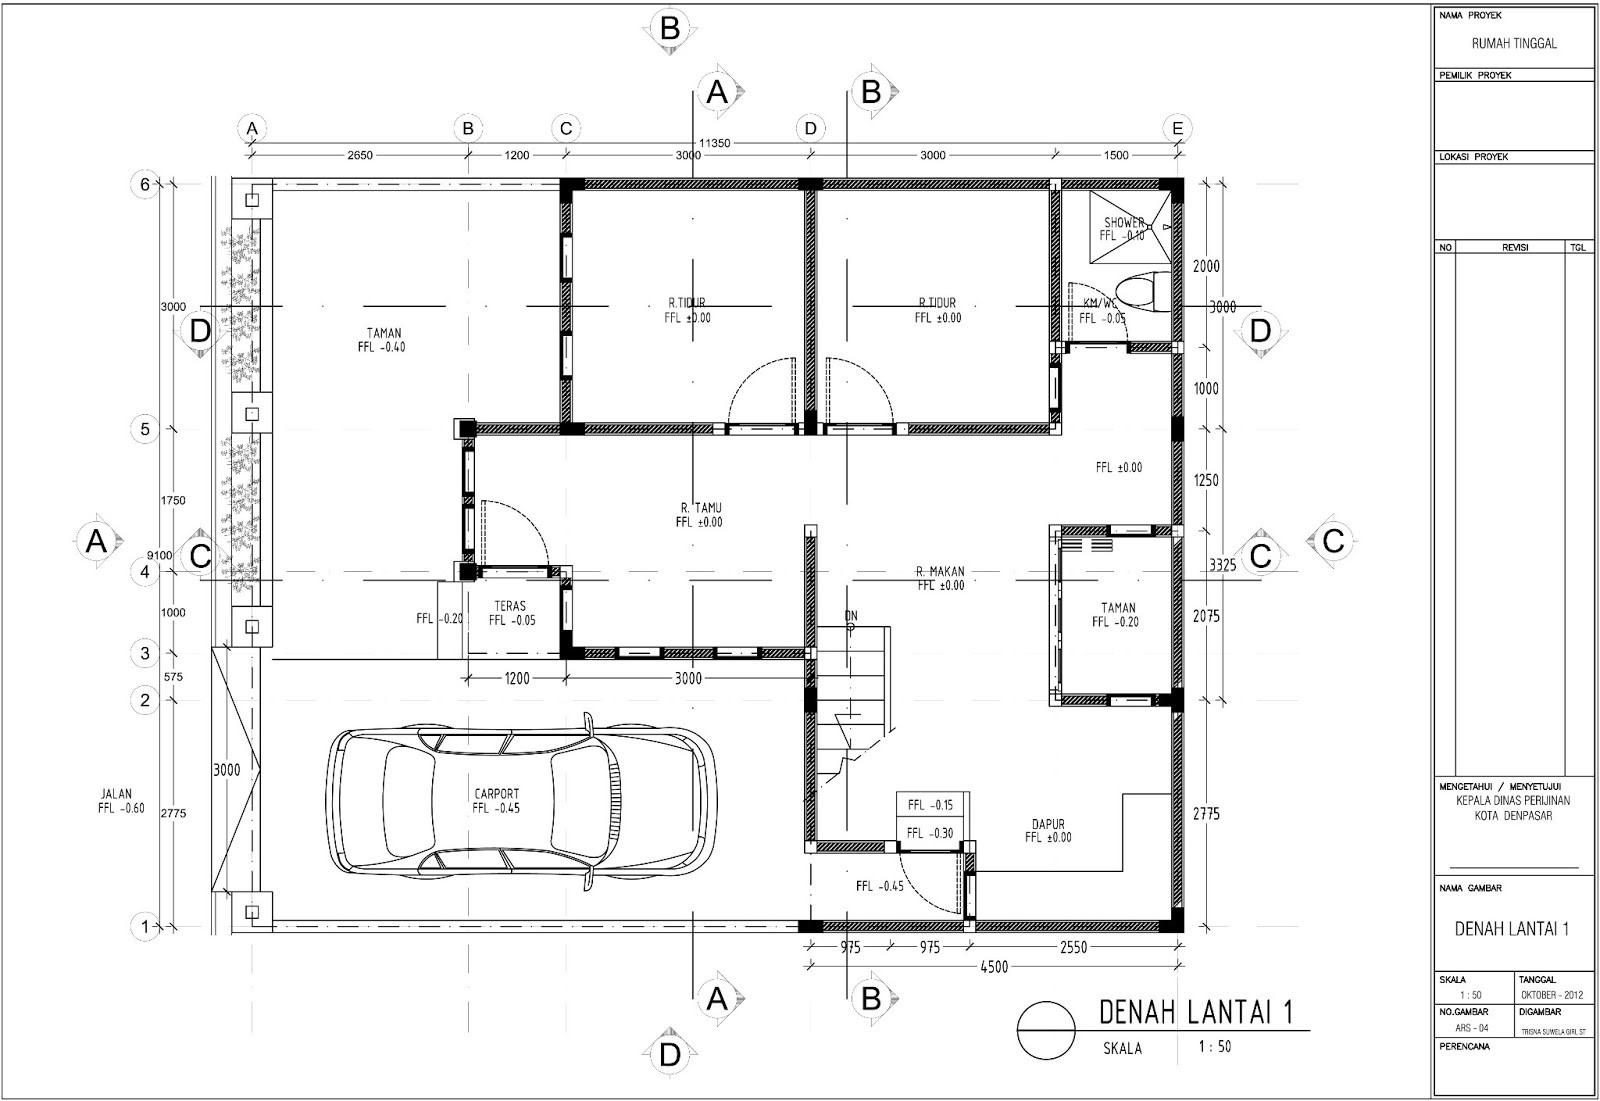 contoh gambar denah rumah untuk imb 3